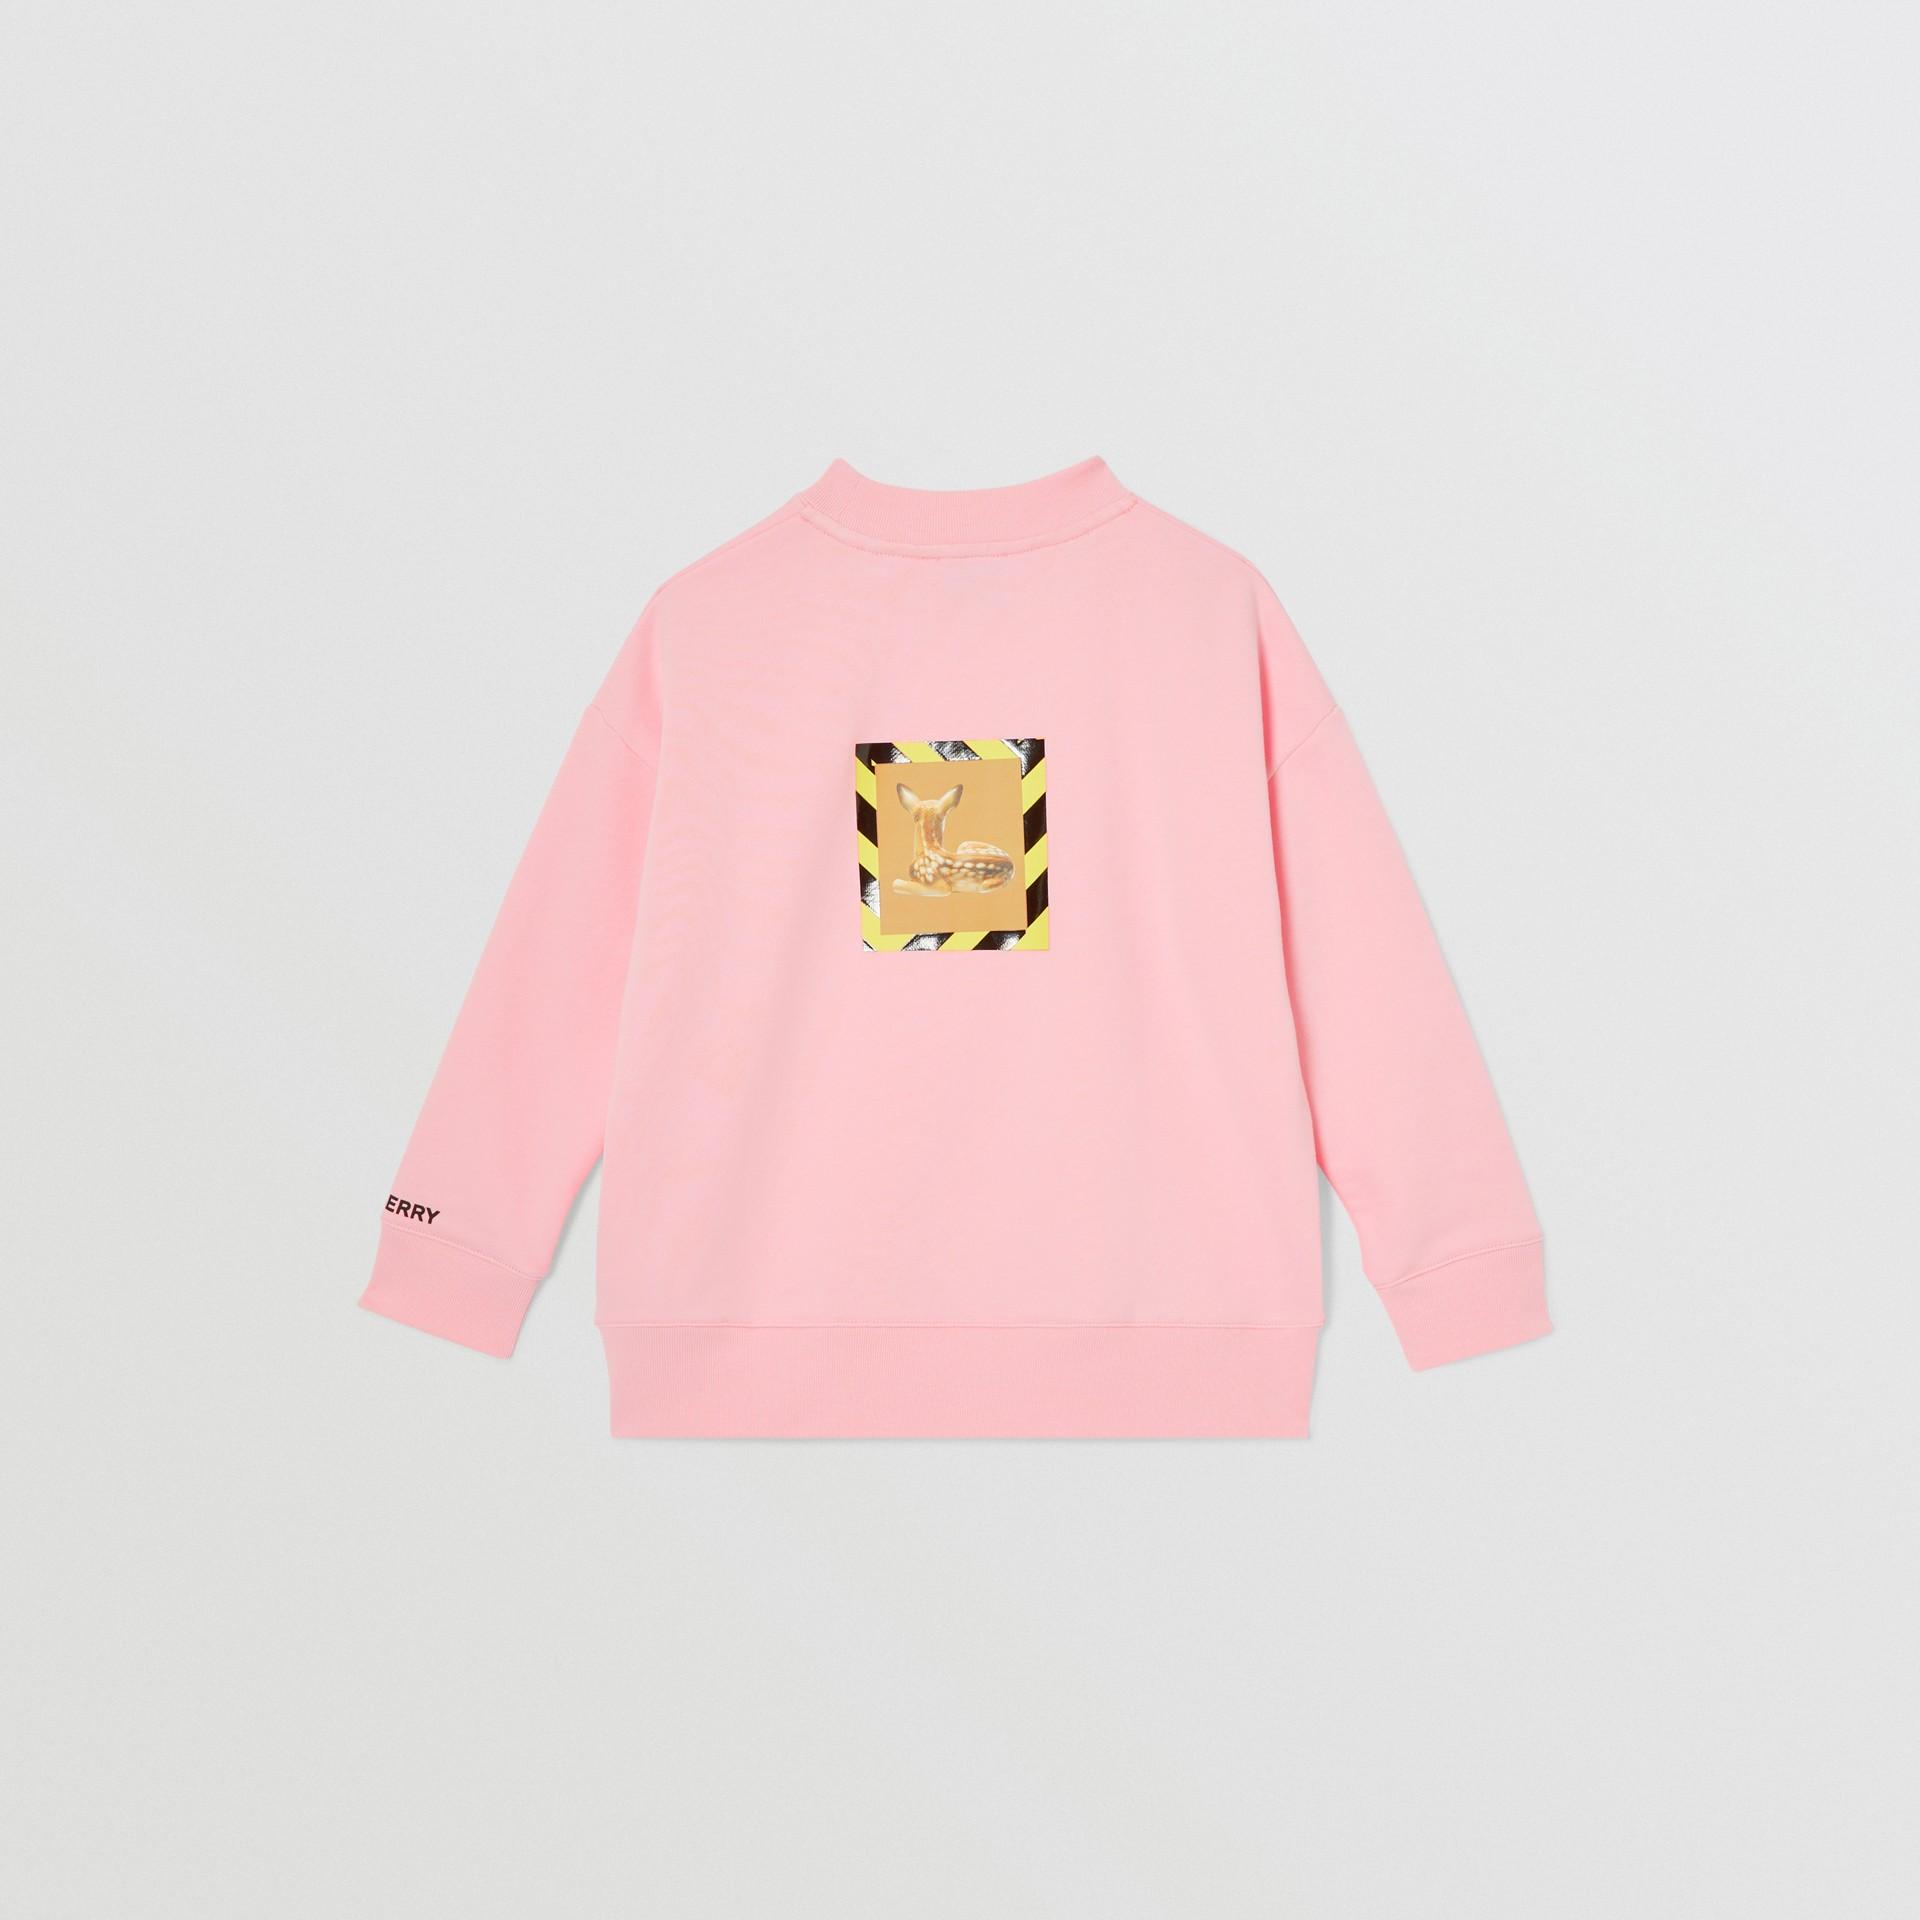 Deer Print Cotton Sweatshirt in Candy Pink | Burberry Australia - gallery image 3